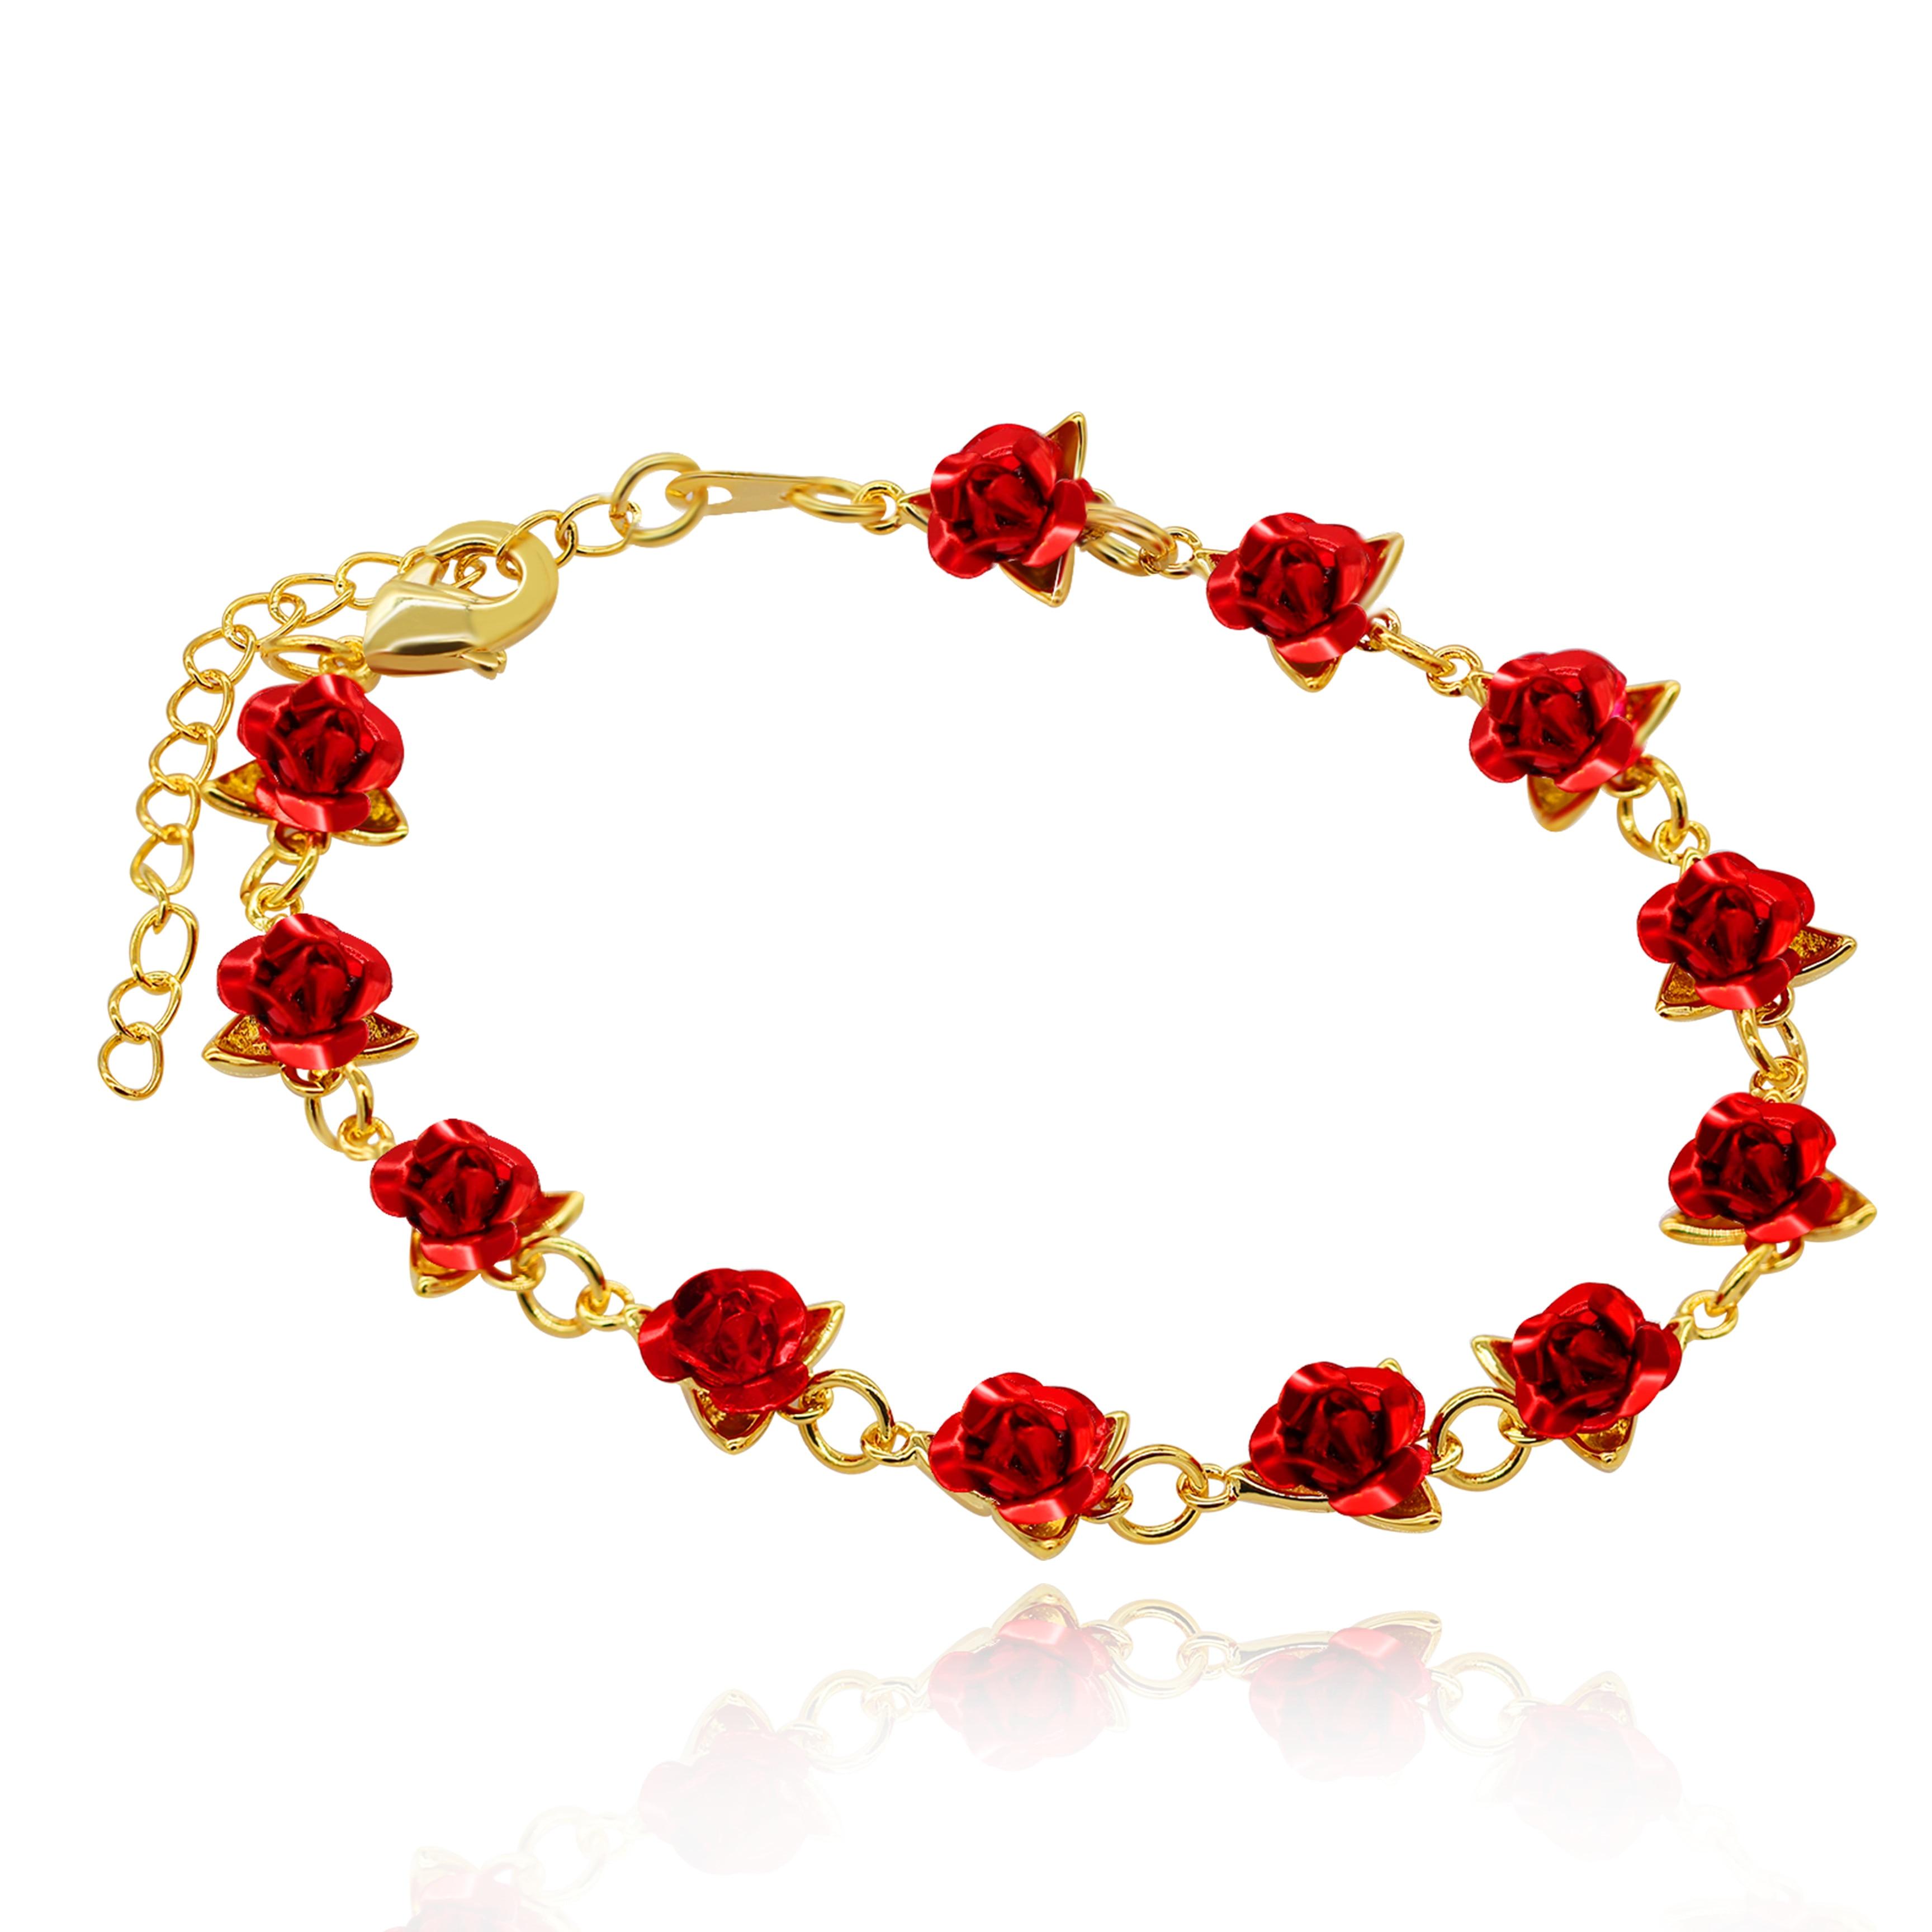 Uloveido Cute Red Rose Flower Charm Bracelet for Women Girls 18K Gold Plated Nature Jewelry, Dozen Roses Bracelets Y452 5% off|Chain & Link Bracelets|   - AliExpress